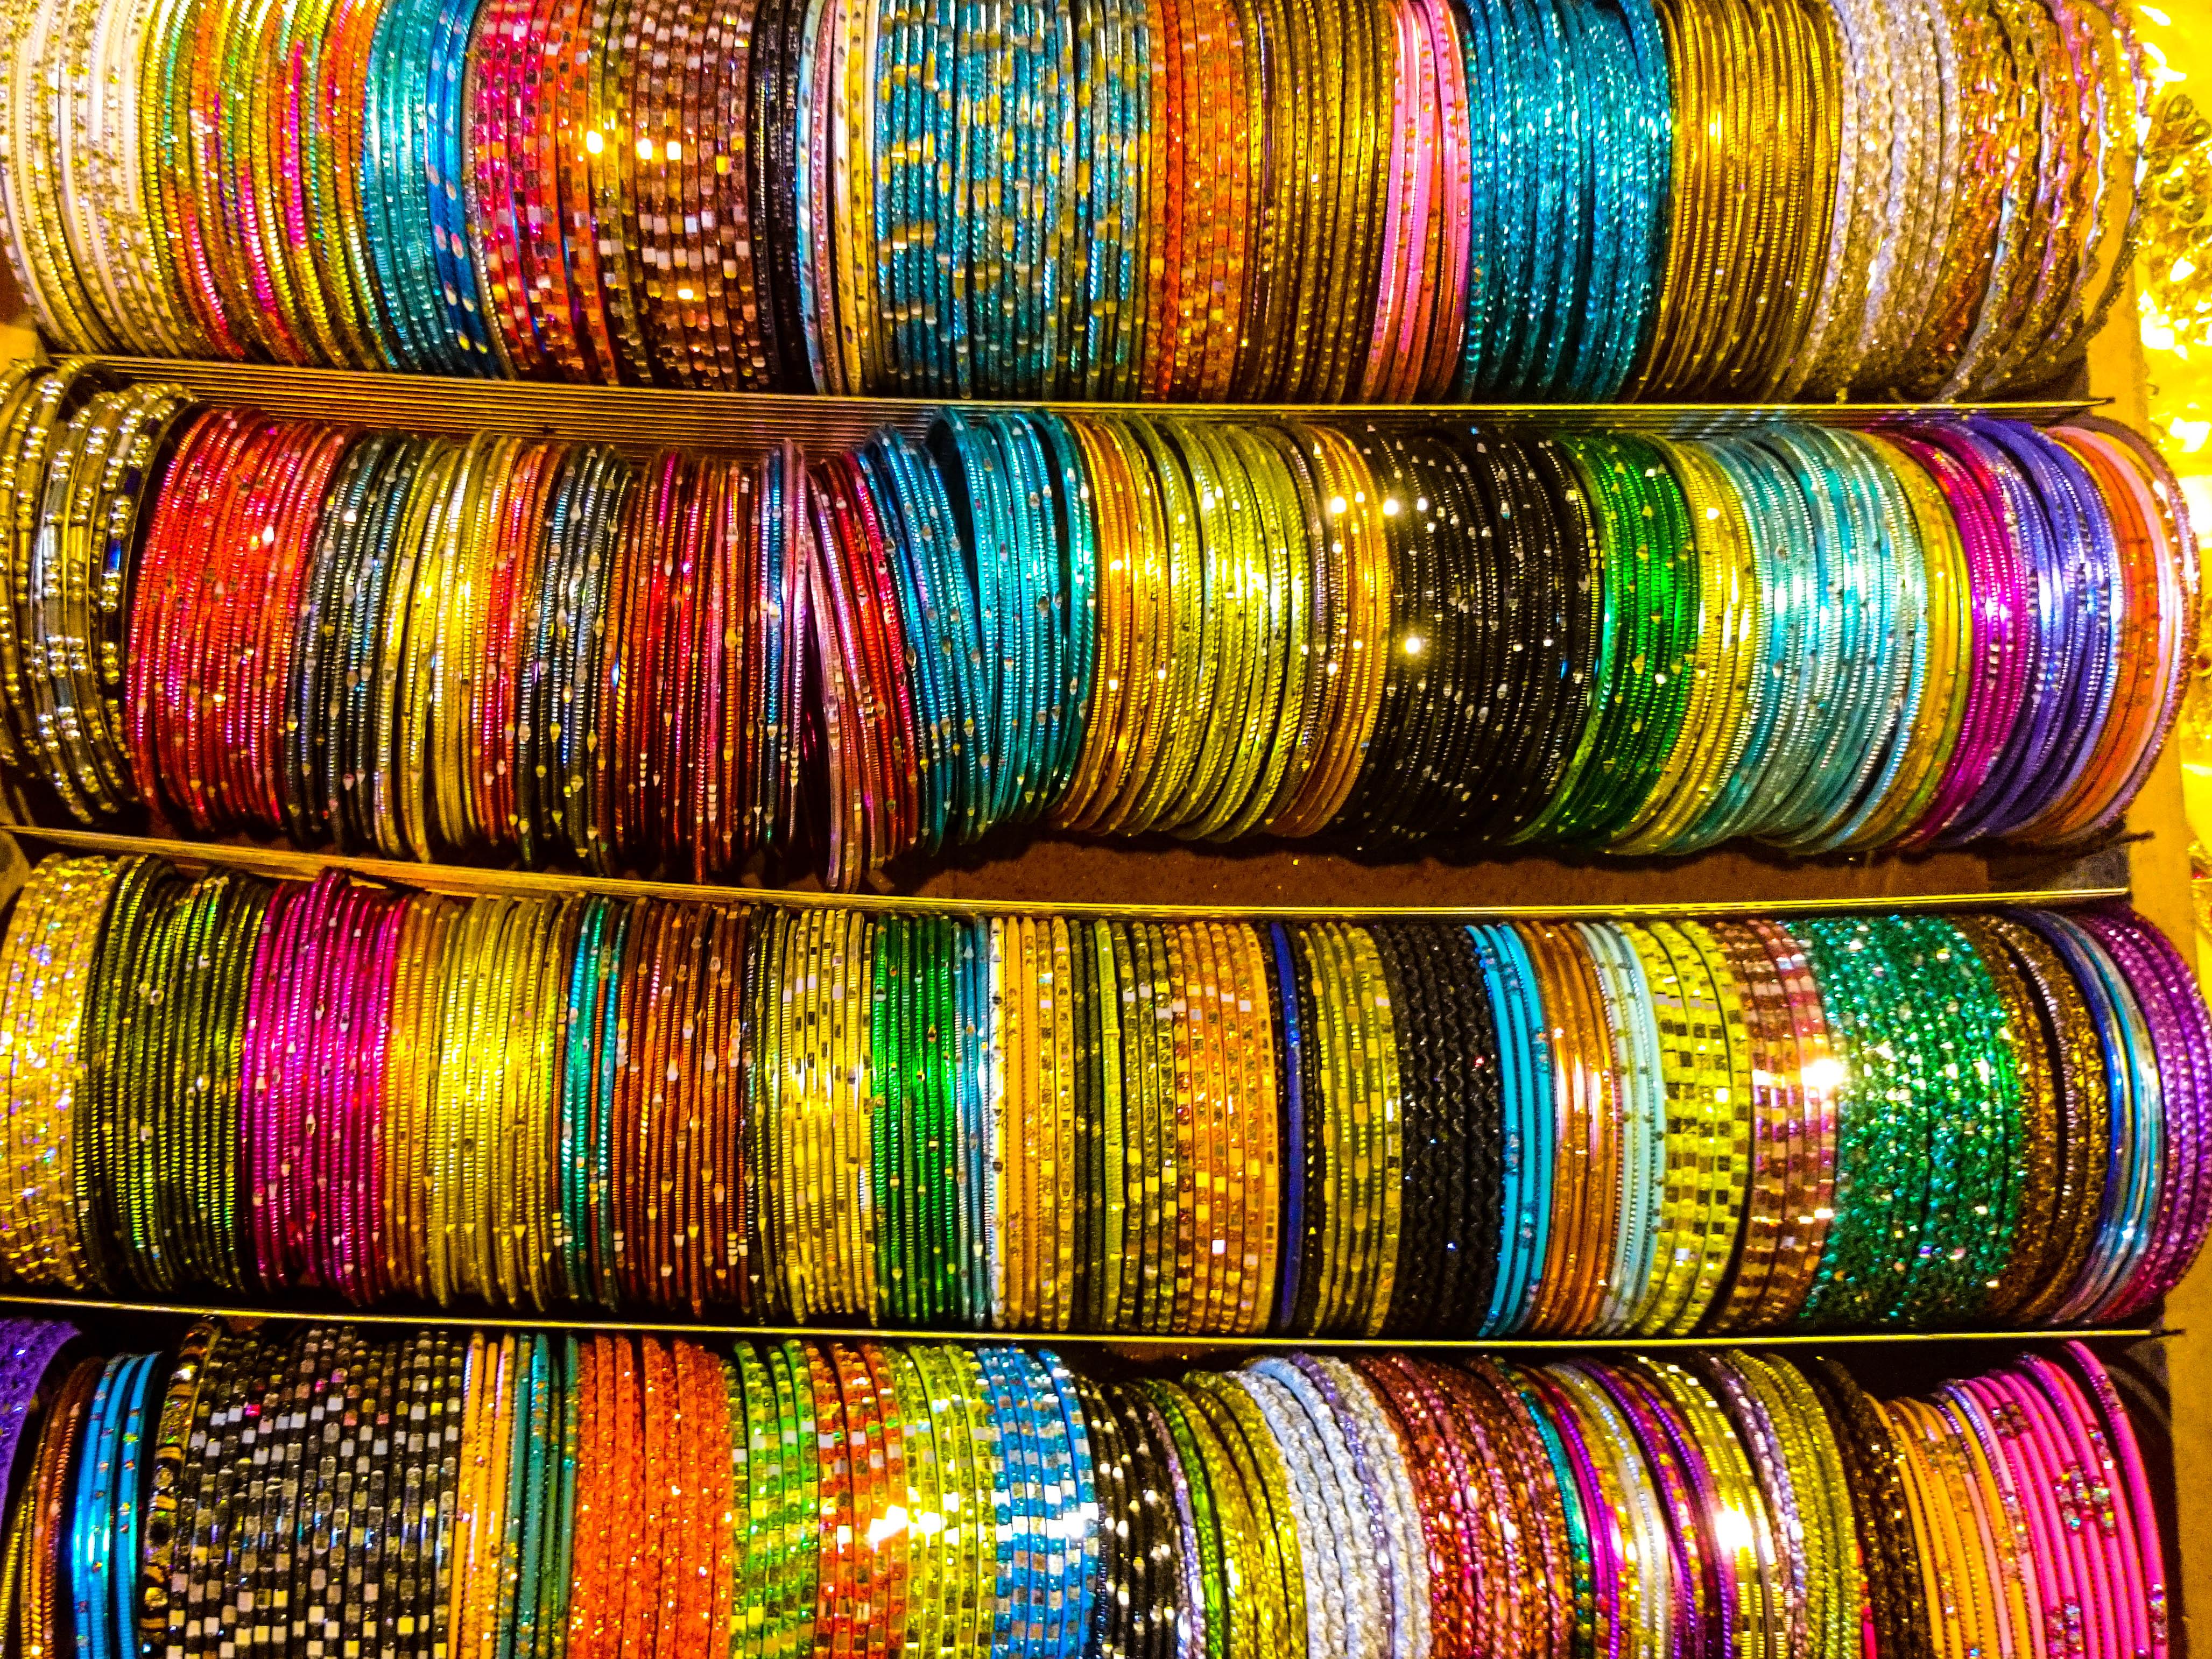 Sunday Market crafts